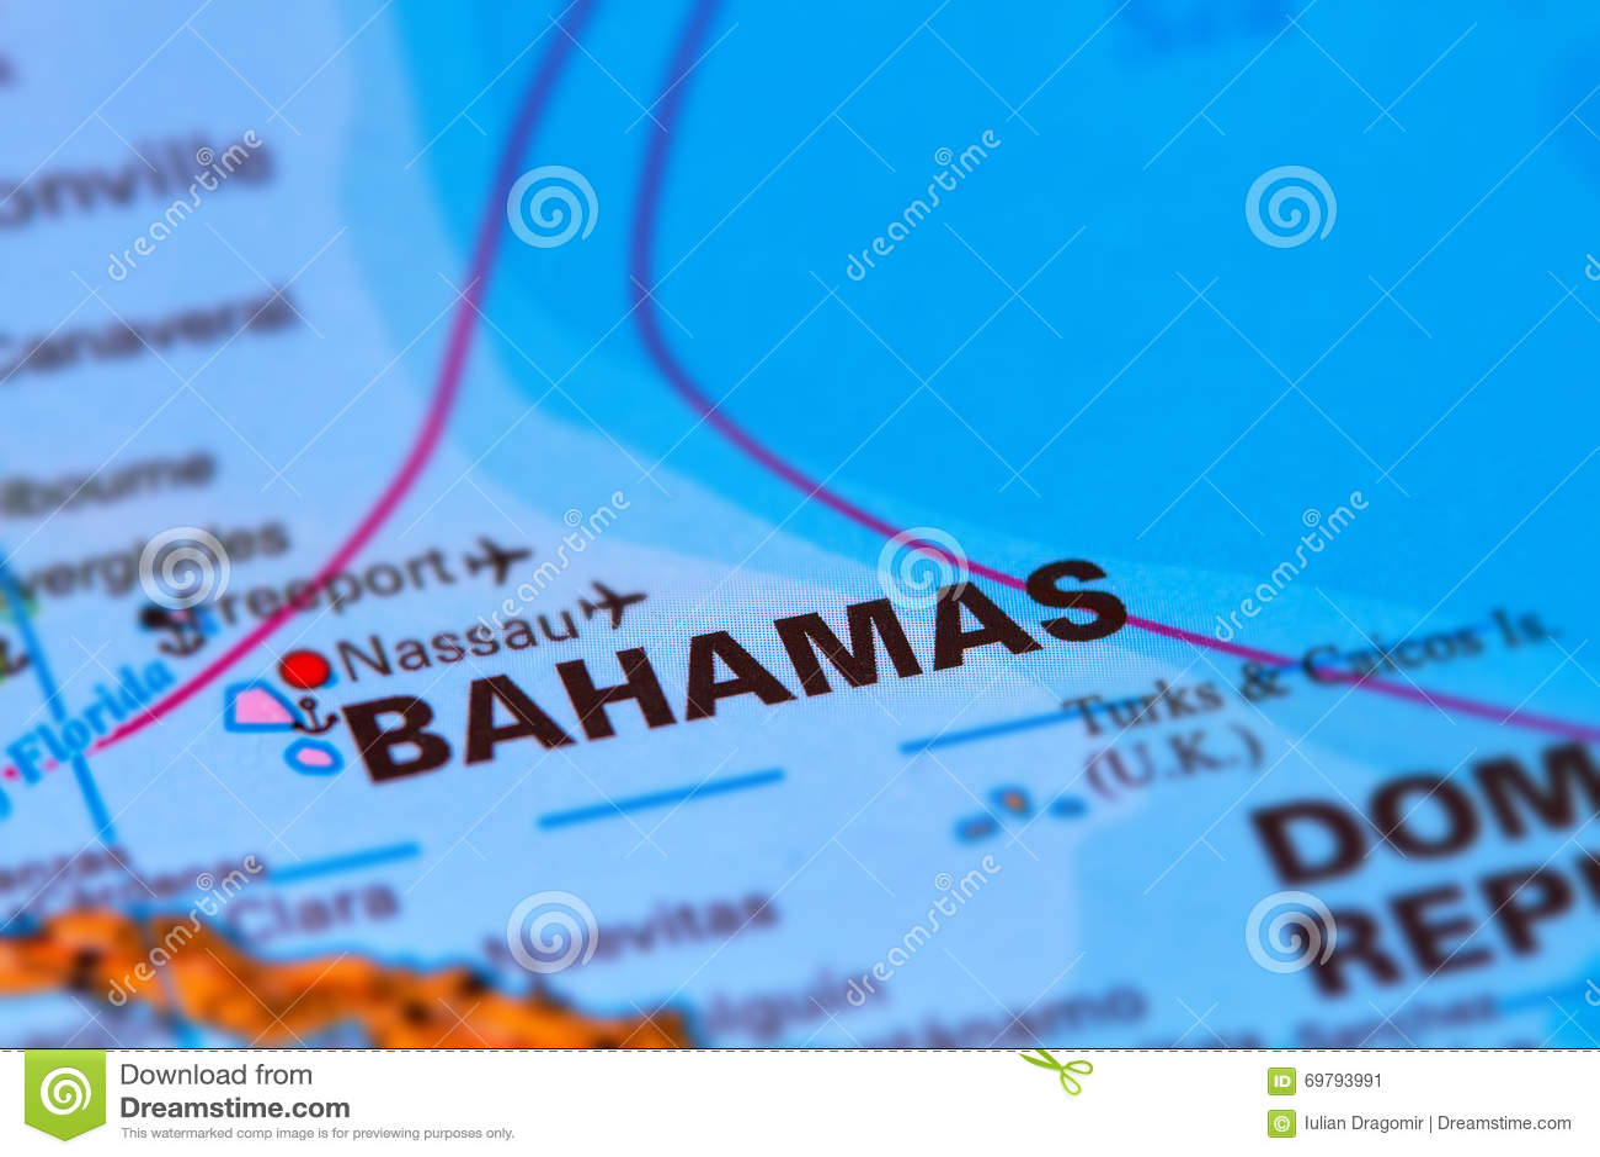 Bahamas Caribbean Island On Map Stock Image - Image of bahamas ... on map showing bahamas, map of lesser antilles and caribbean, map caribbean vacation, map of caribbean area, map of bahamas paradise island, map of florida, map of atlantis bahamas, map of puerto rico and caribbean, map of bermuda and caribbean, map bahamas caribbean islands, map of trinidad and caribbean, map of caribbean islands, map of dominica and caribbean, map of texas and caribbean, map of caribbean sea, bermuda islands map caribbean, map of us and caribbean, map of the bahamas, map of central america, full map of caribbean,